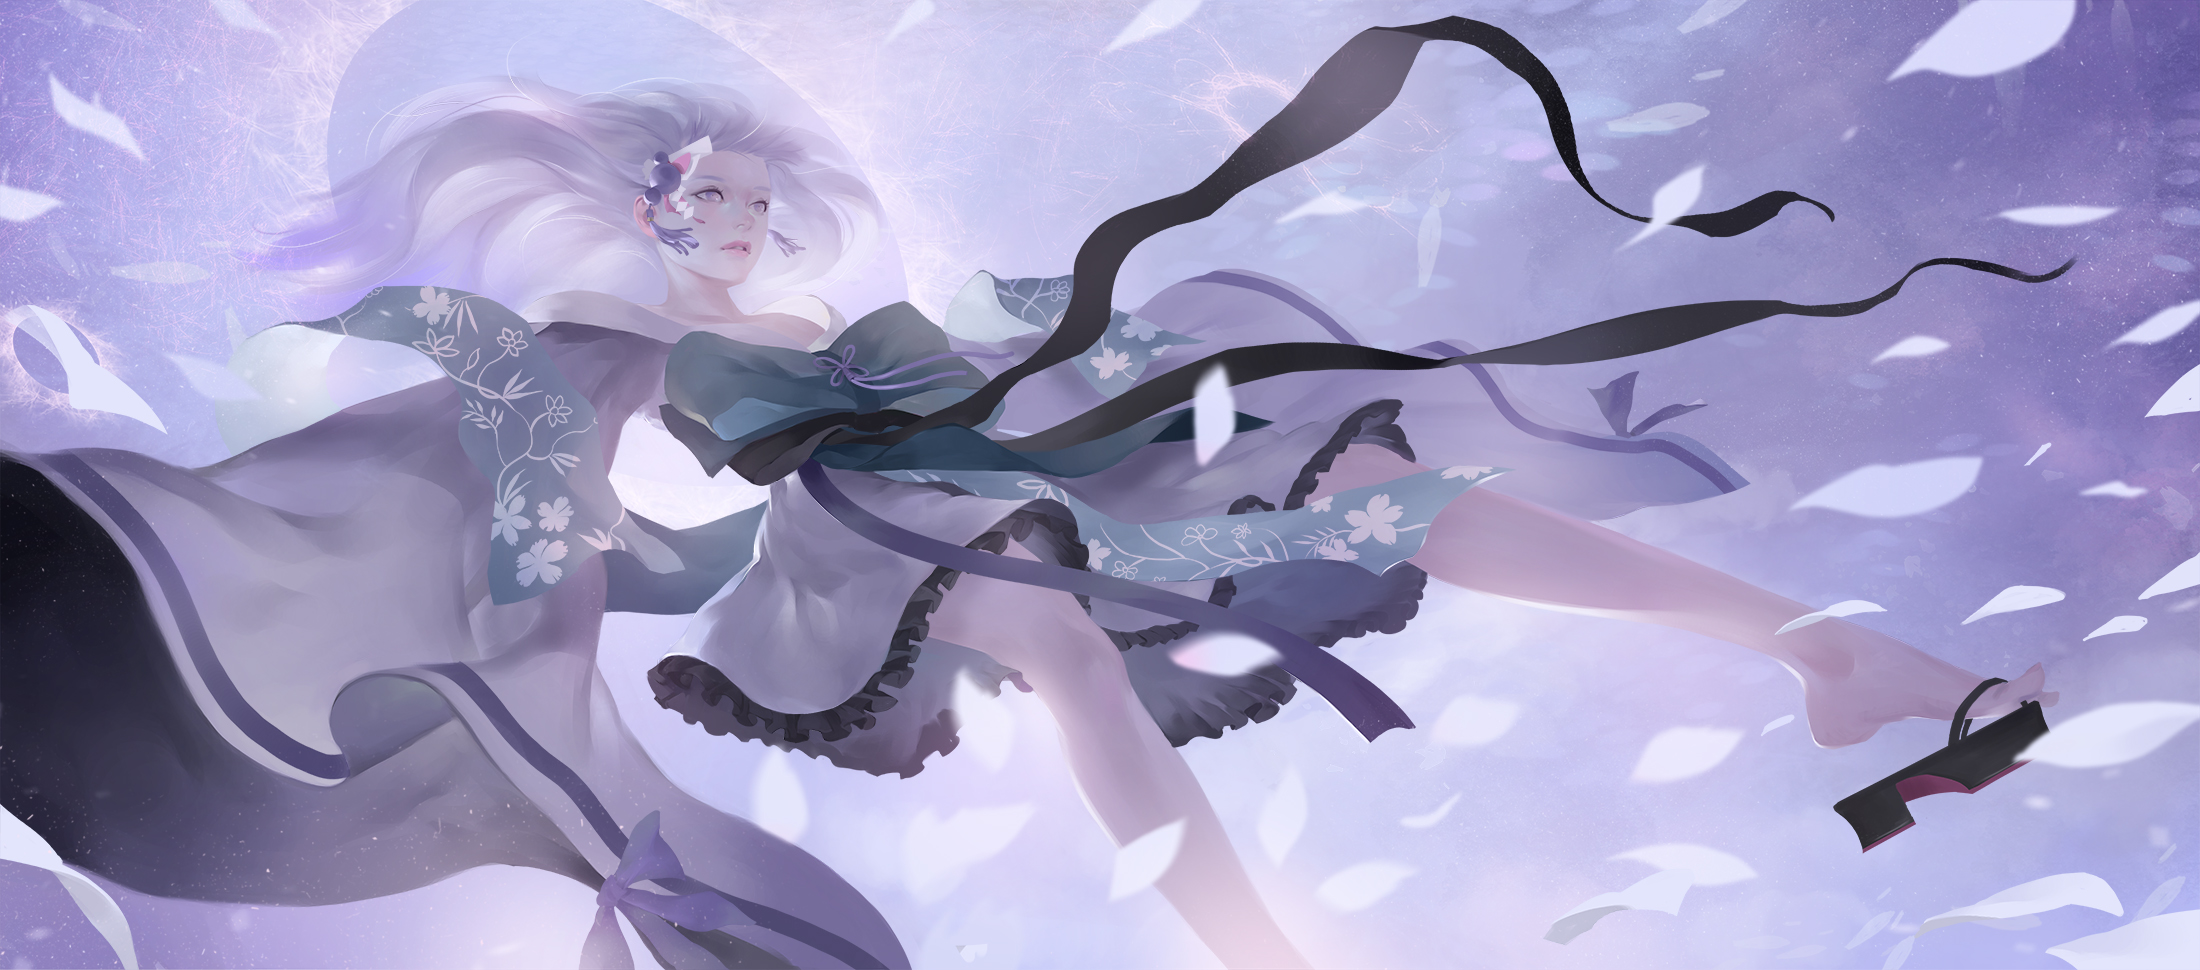 Digital Art Illustration Midfinger Original Characters 2200x970